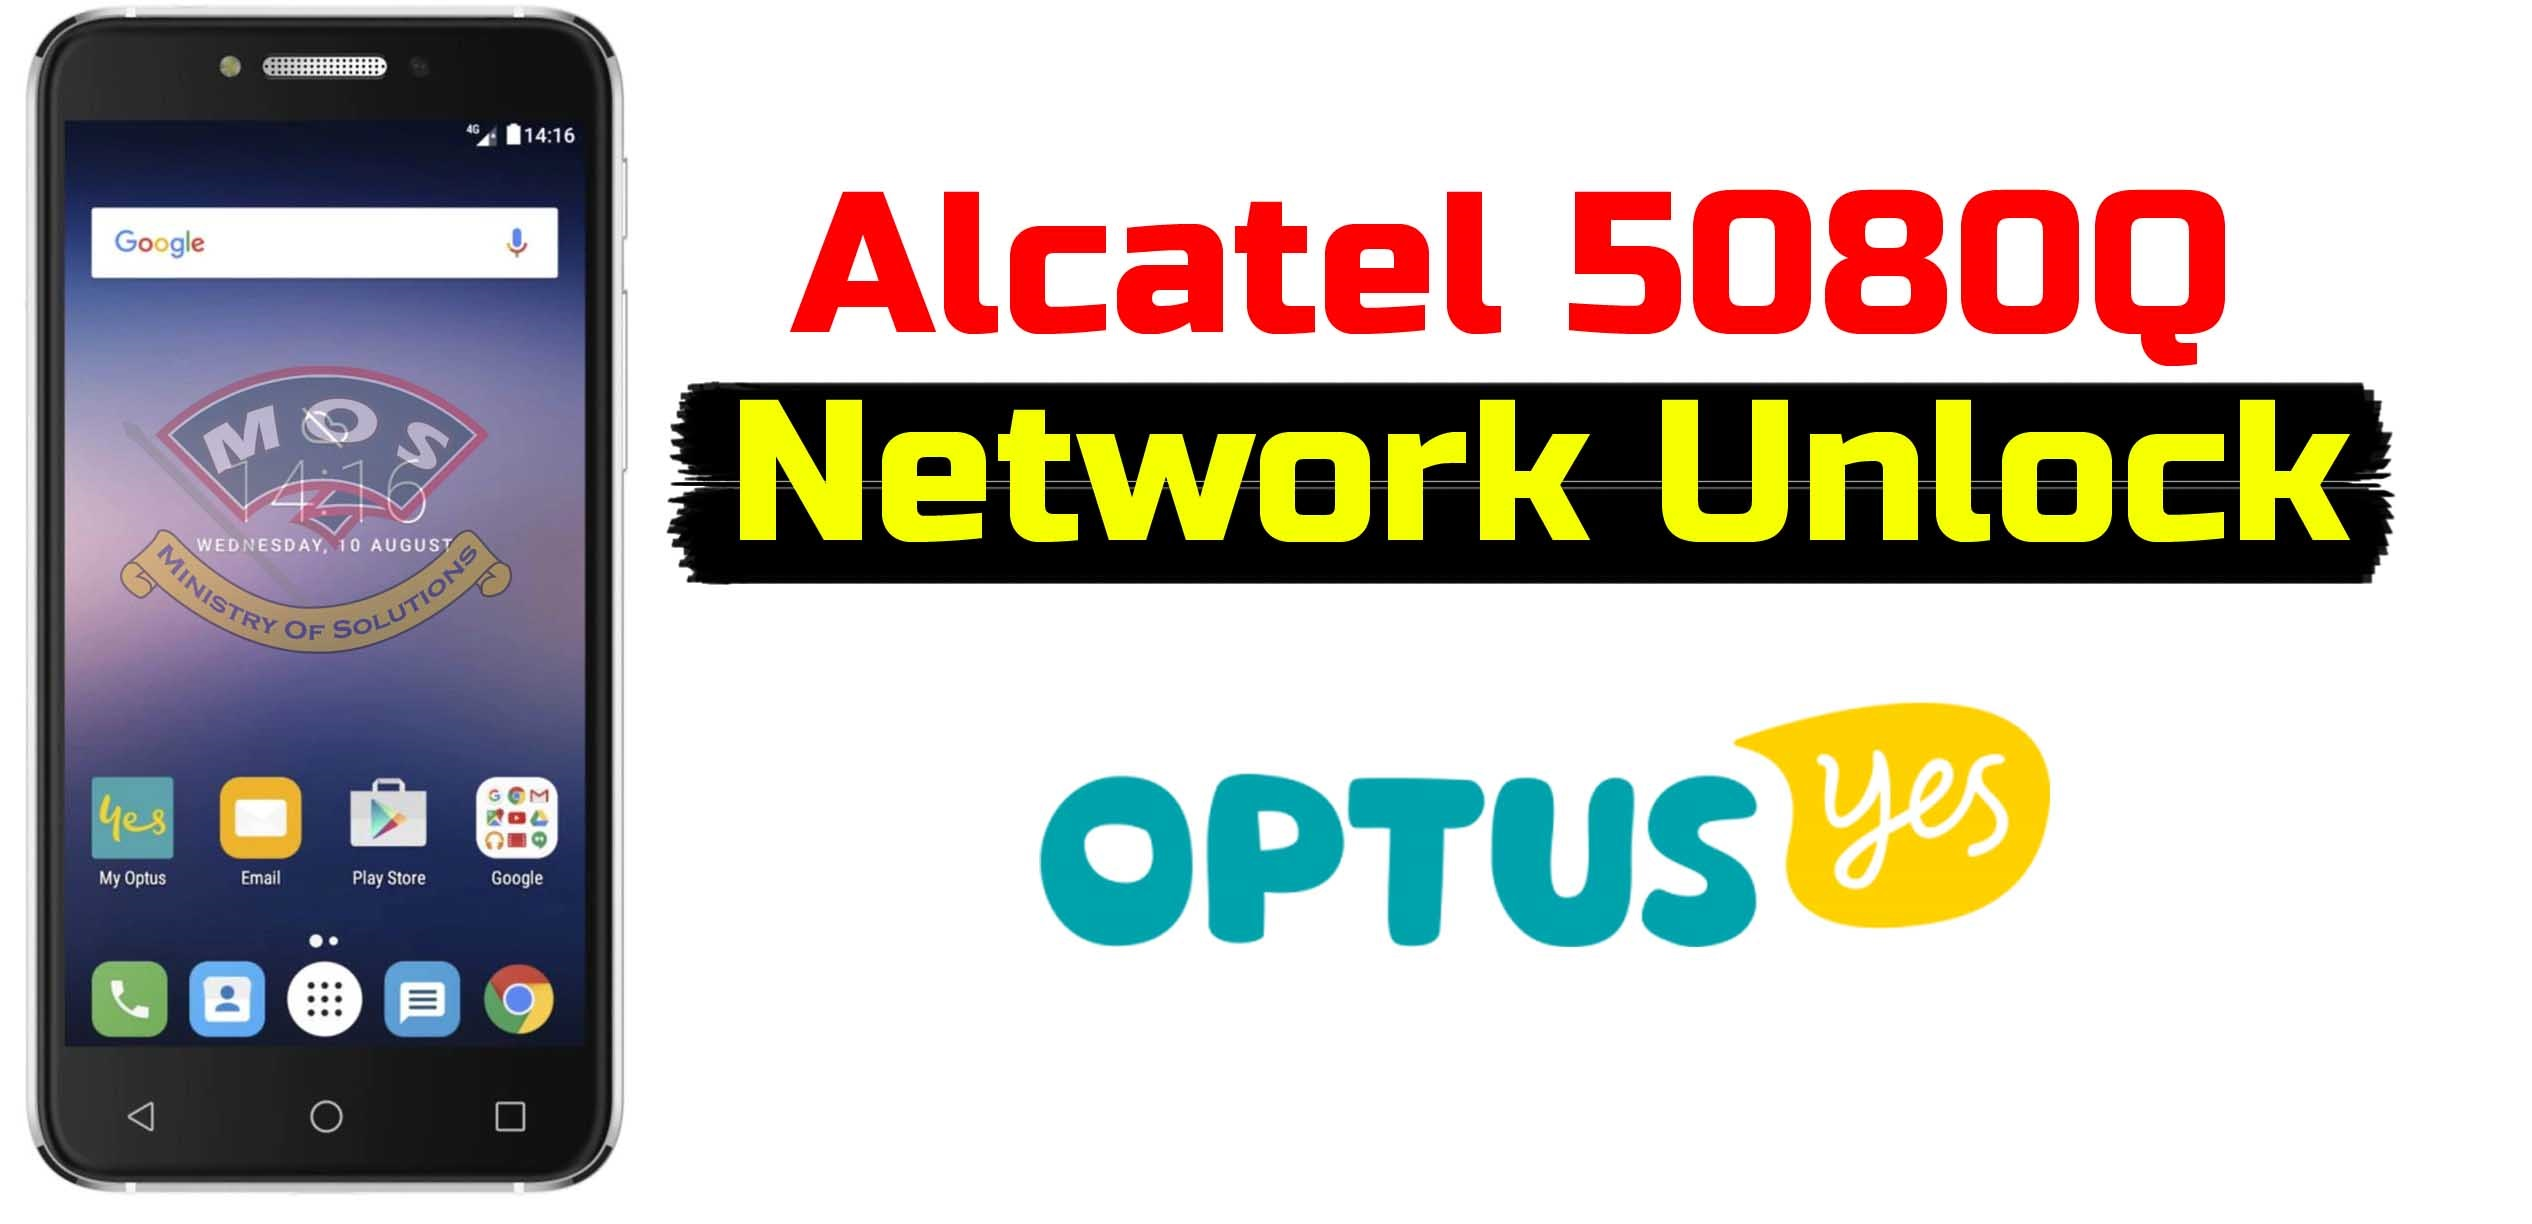 Alcatel 5080Q Network unlock code (Optus-Australia